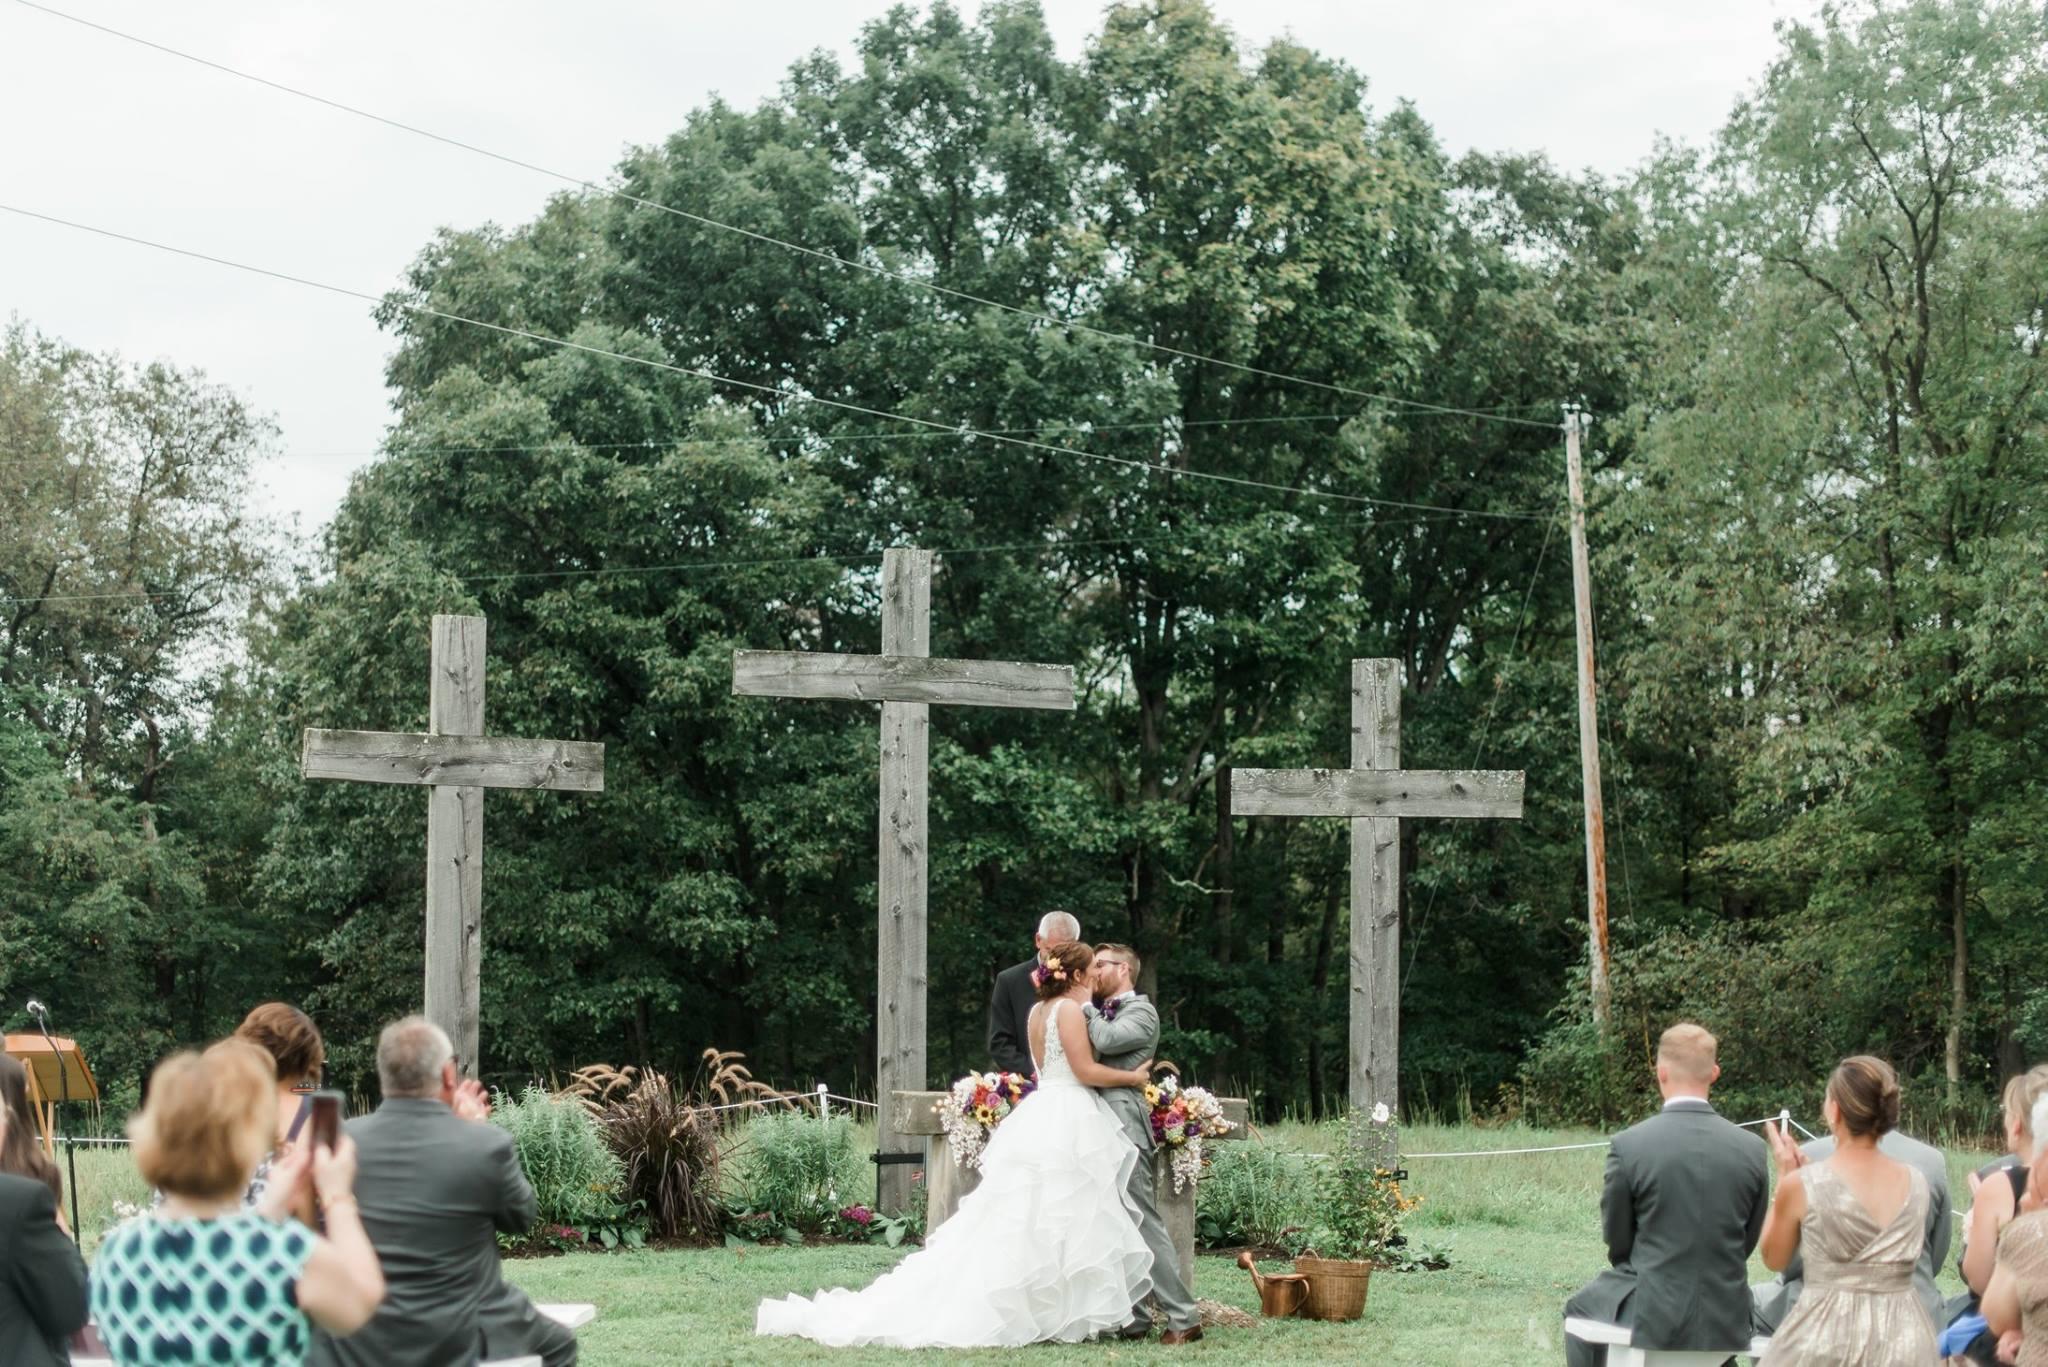 pennsylvania-backyard-wedding-love-diy-bohemian-romantic-colorful-0028.jpg